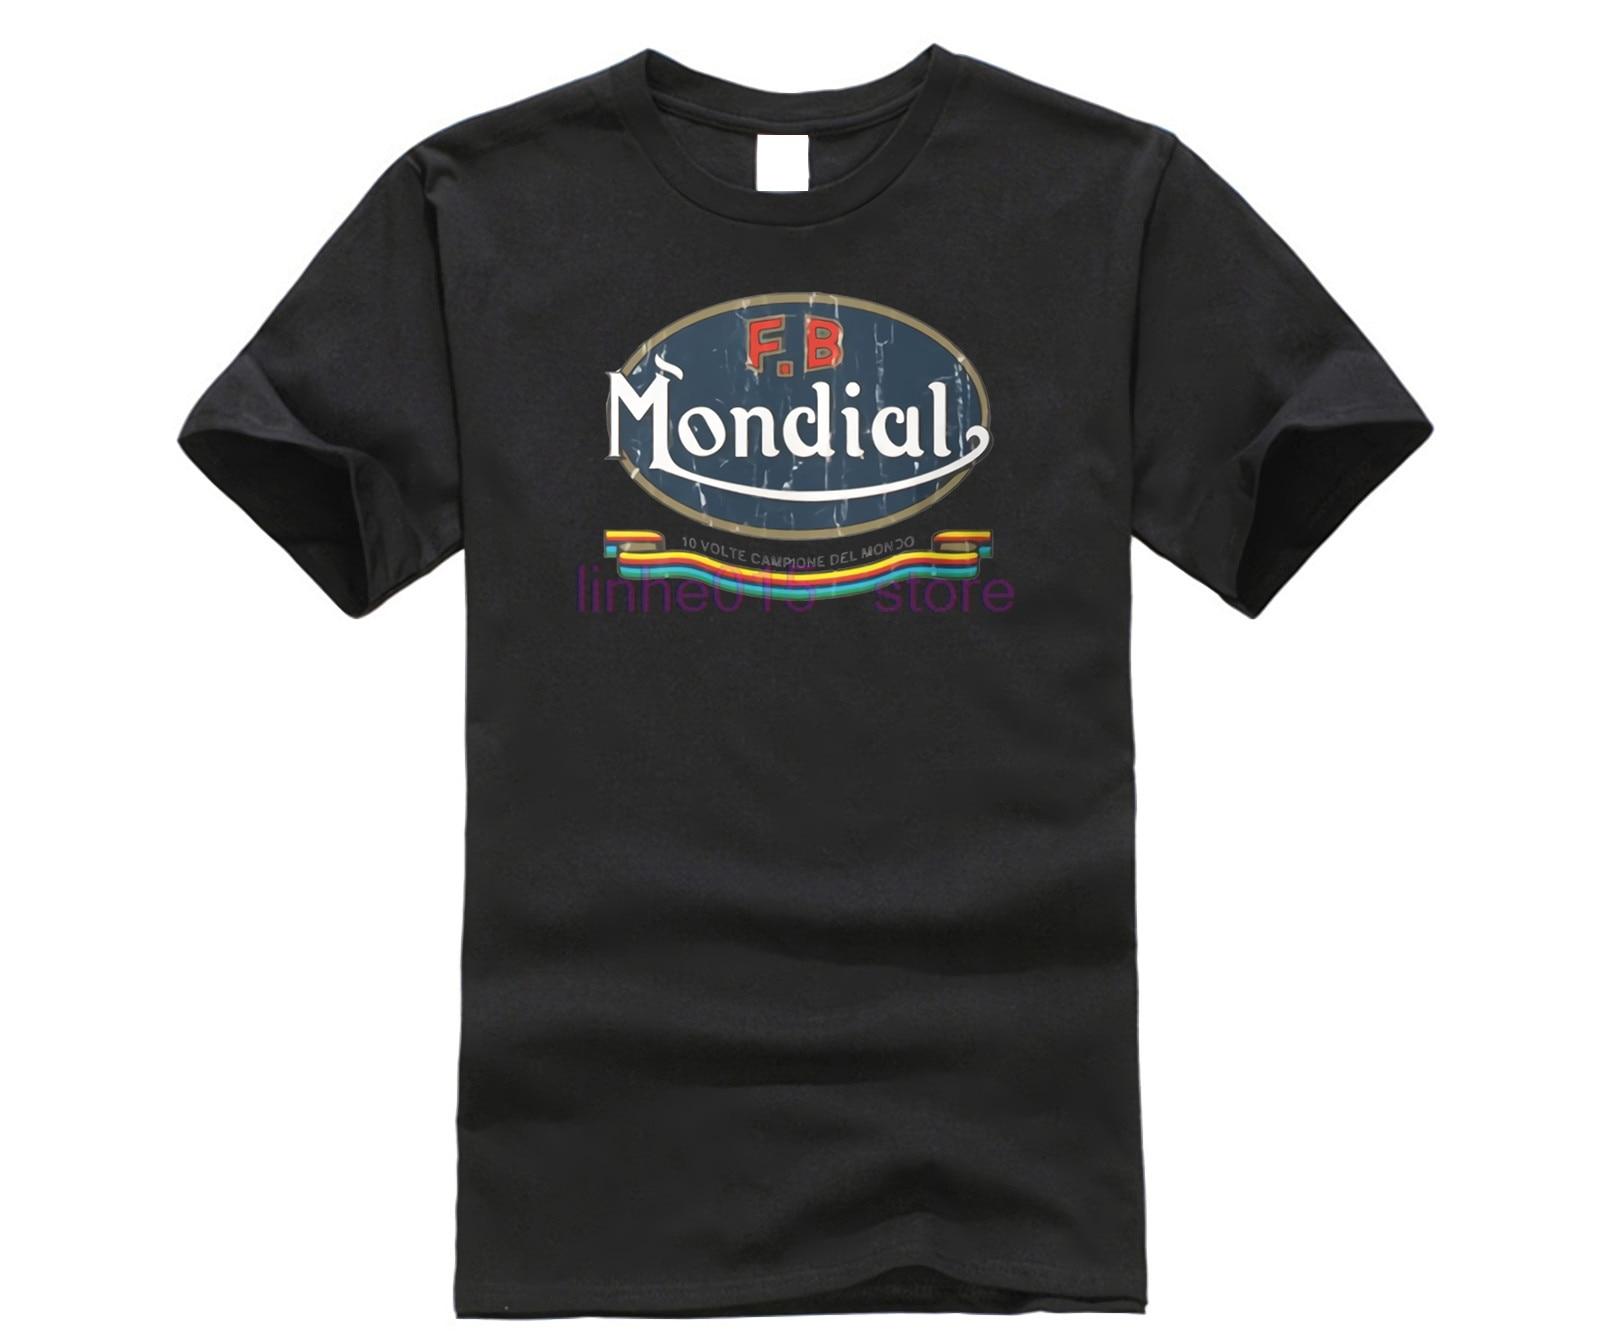 Camiseta divertida de manga corta de algodón para hombre, camiseta para hombre, motondial Fb Ribbon Schwarz Unverwechselt